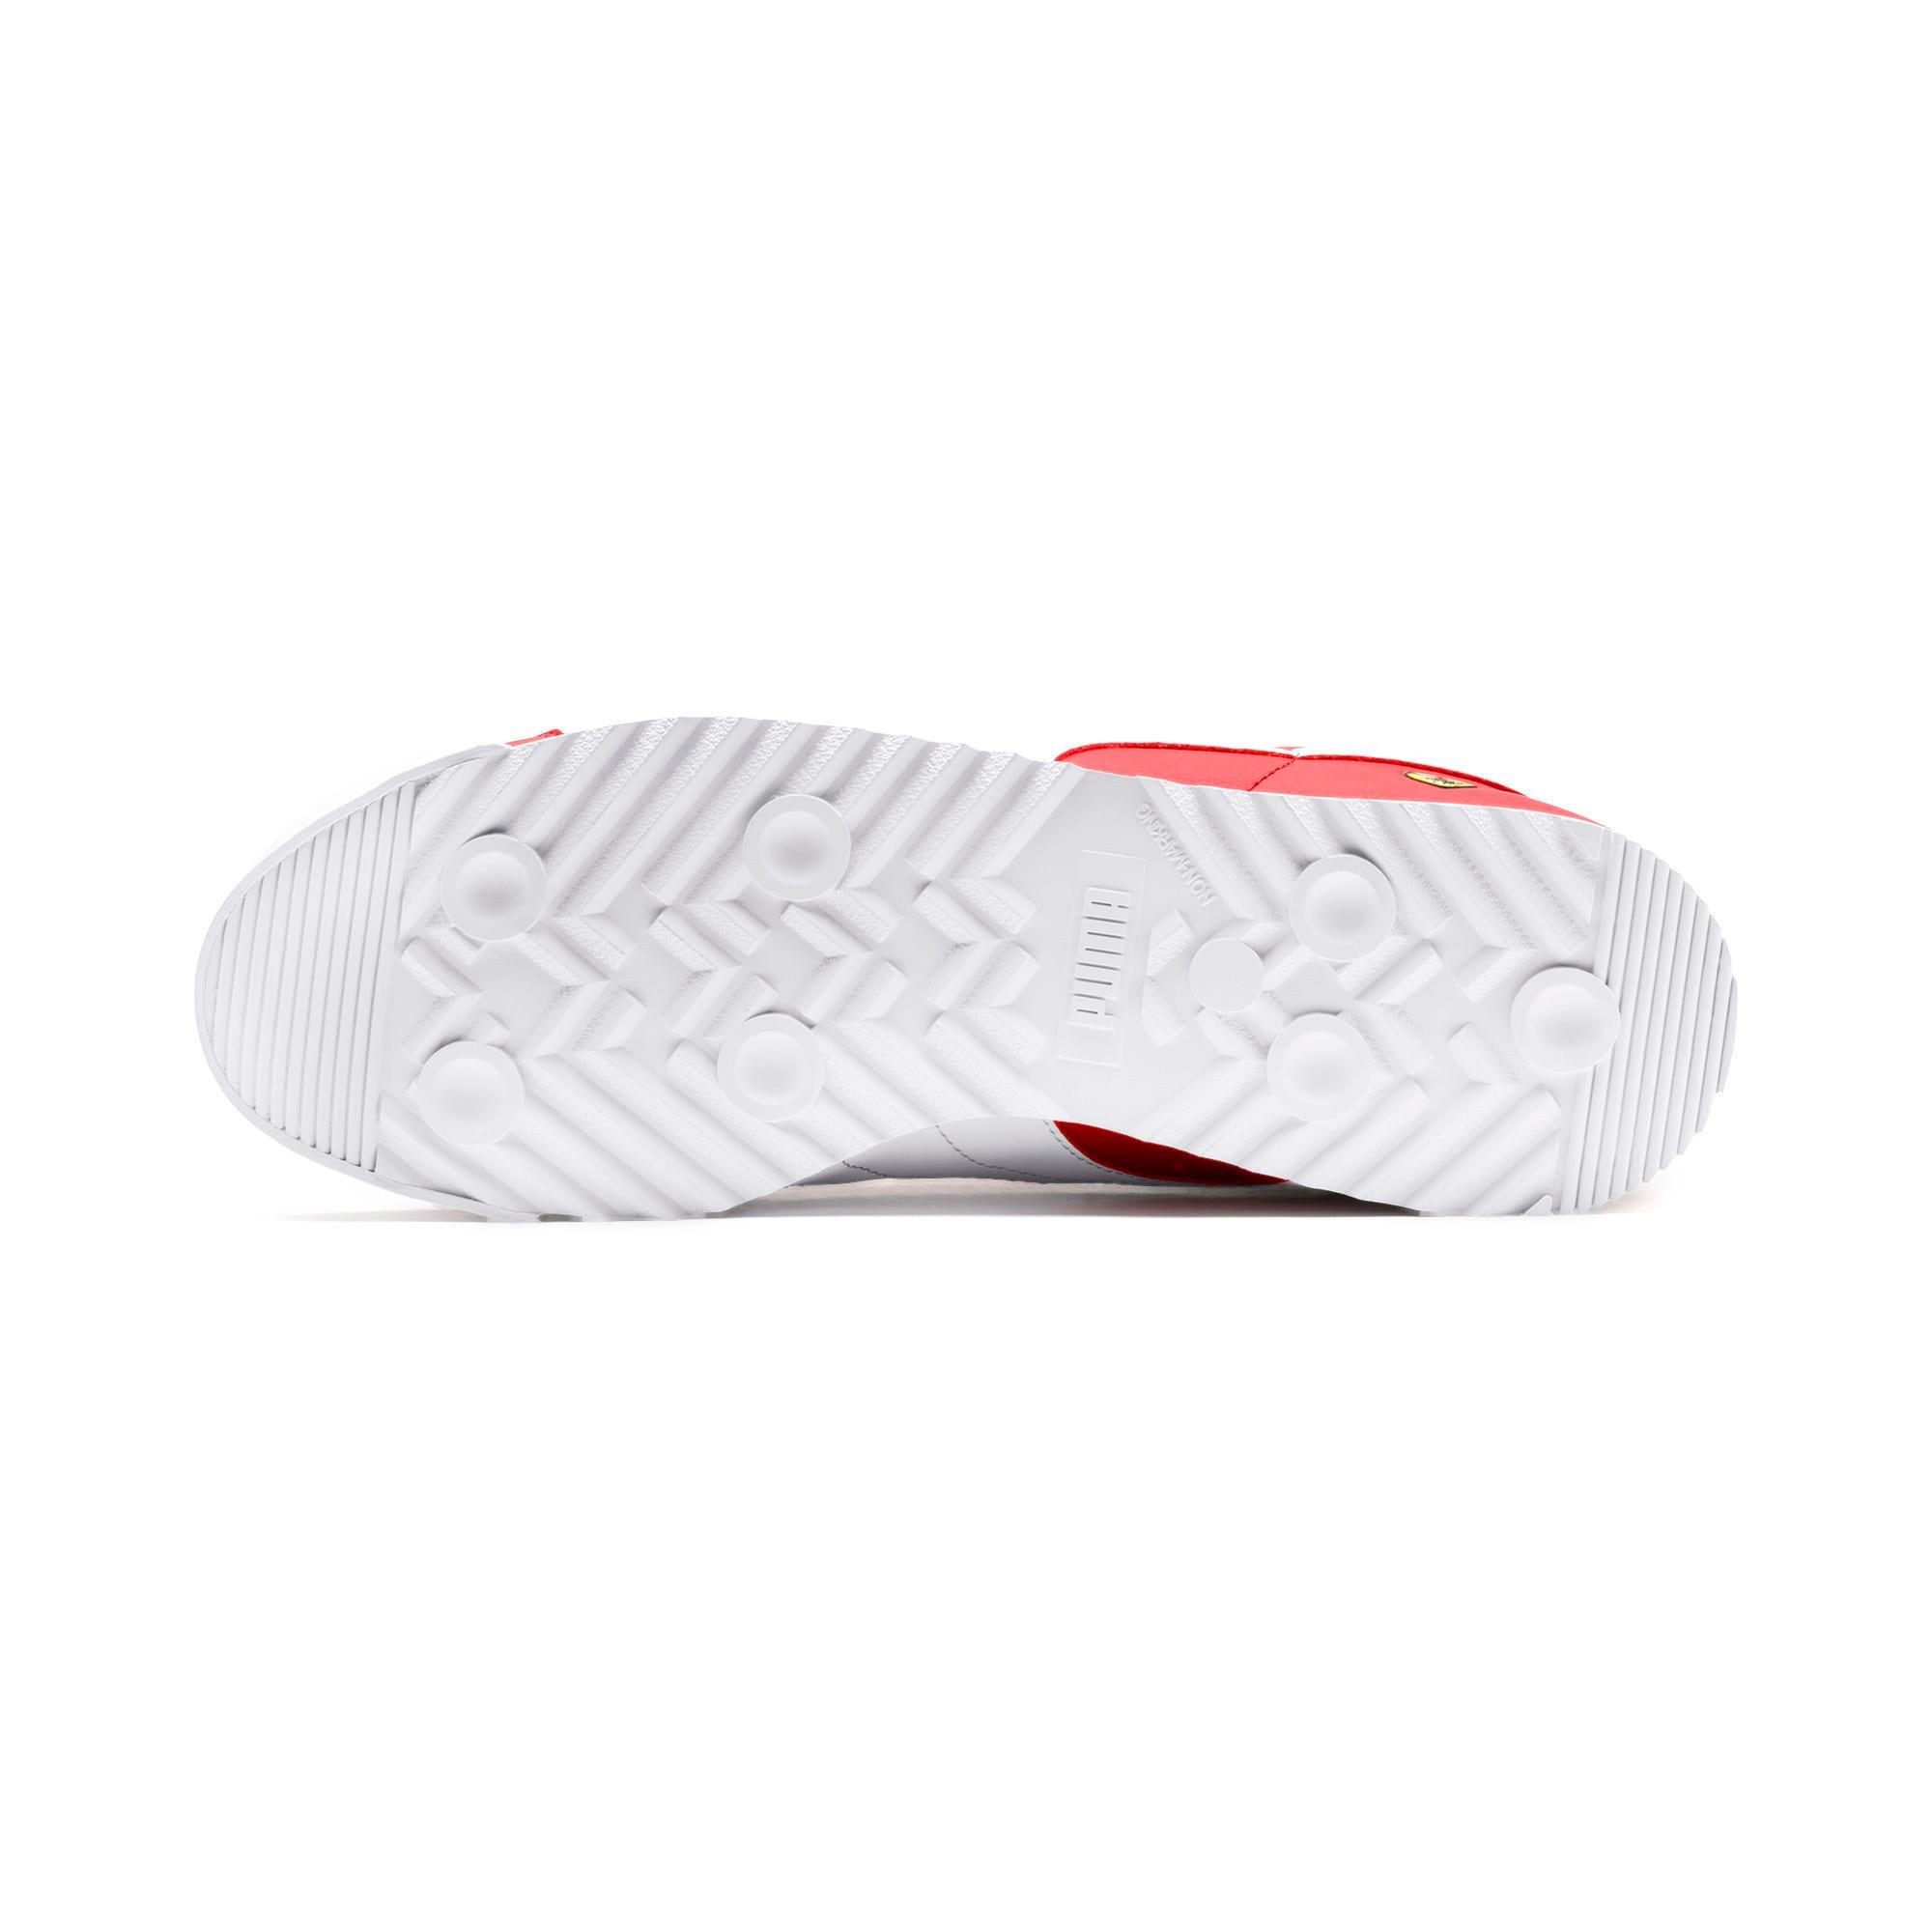 Thumbnail 5 of Scuderia Ferrari Roma Men's Sneakers, Rosso Corsa-White-Black, medium